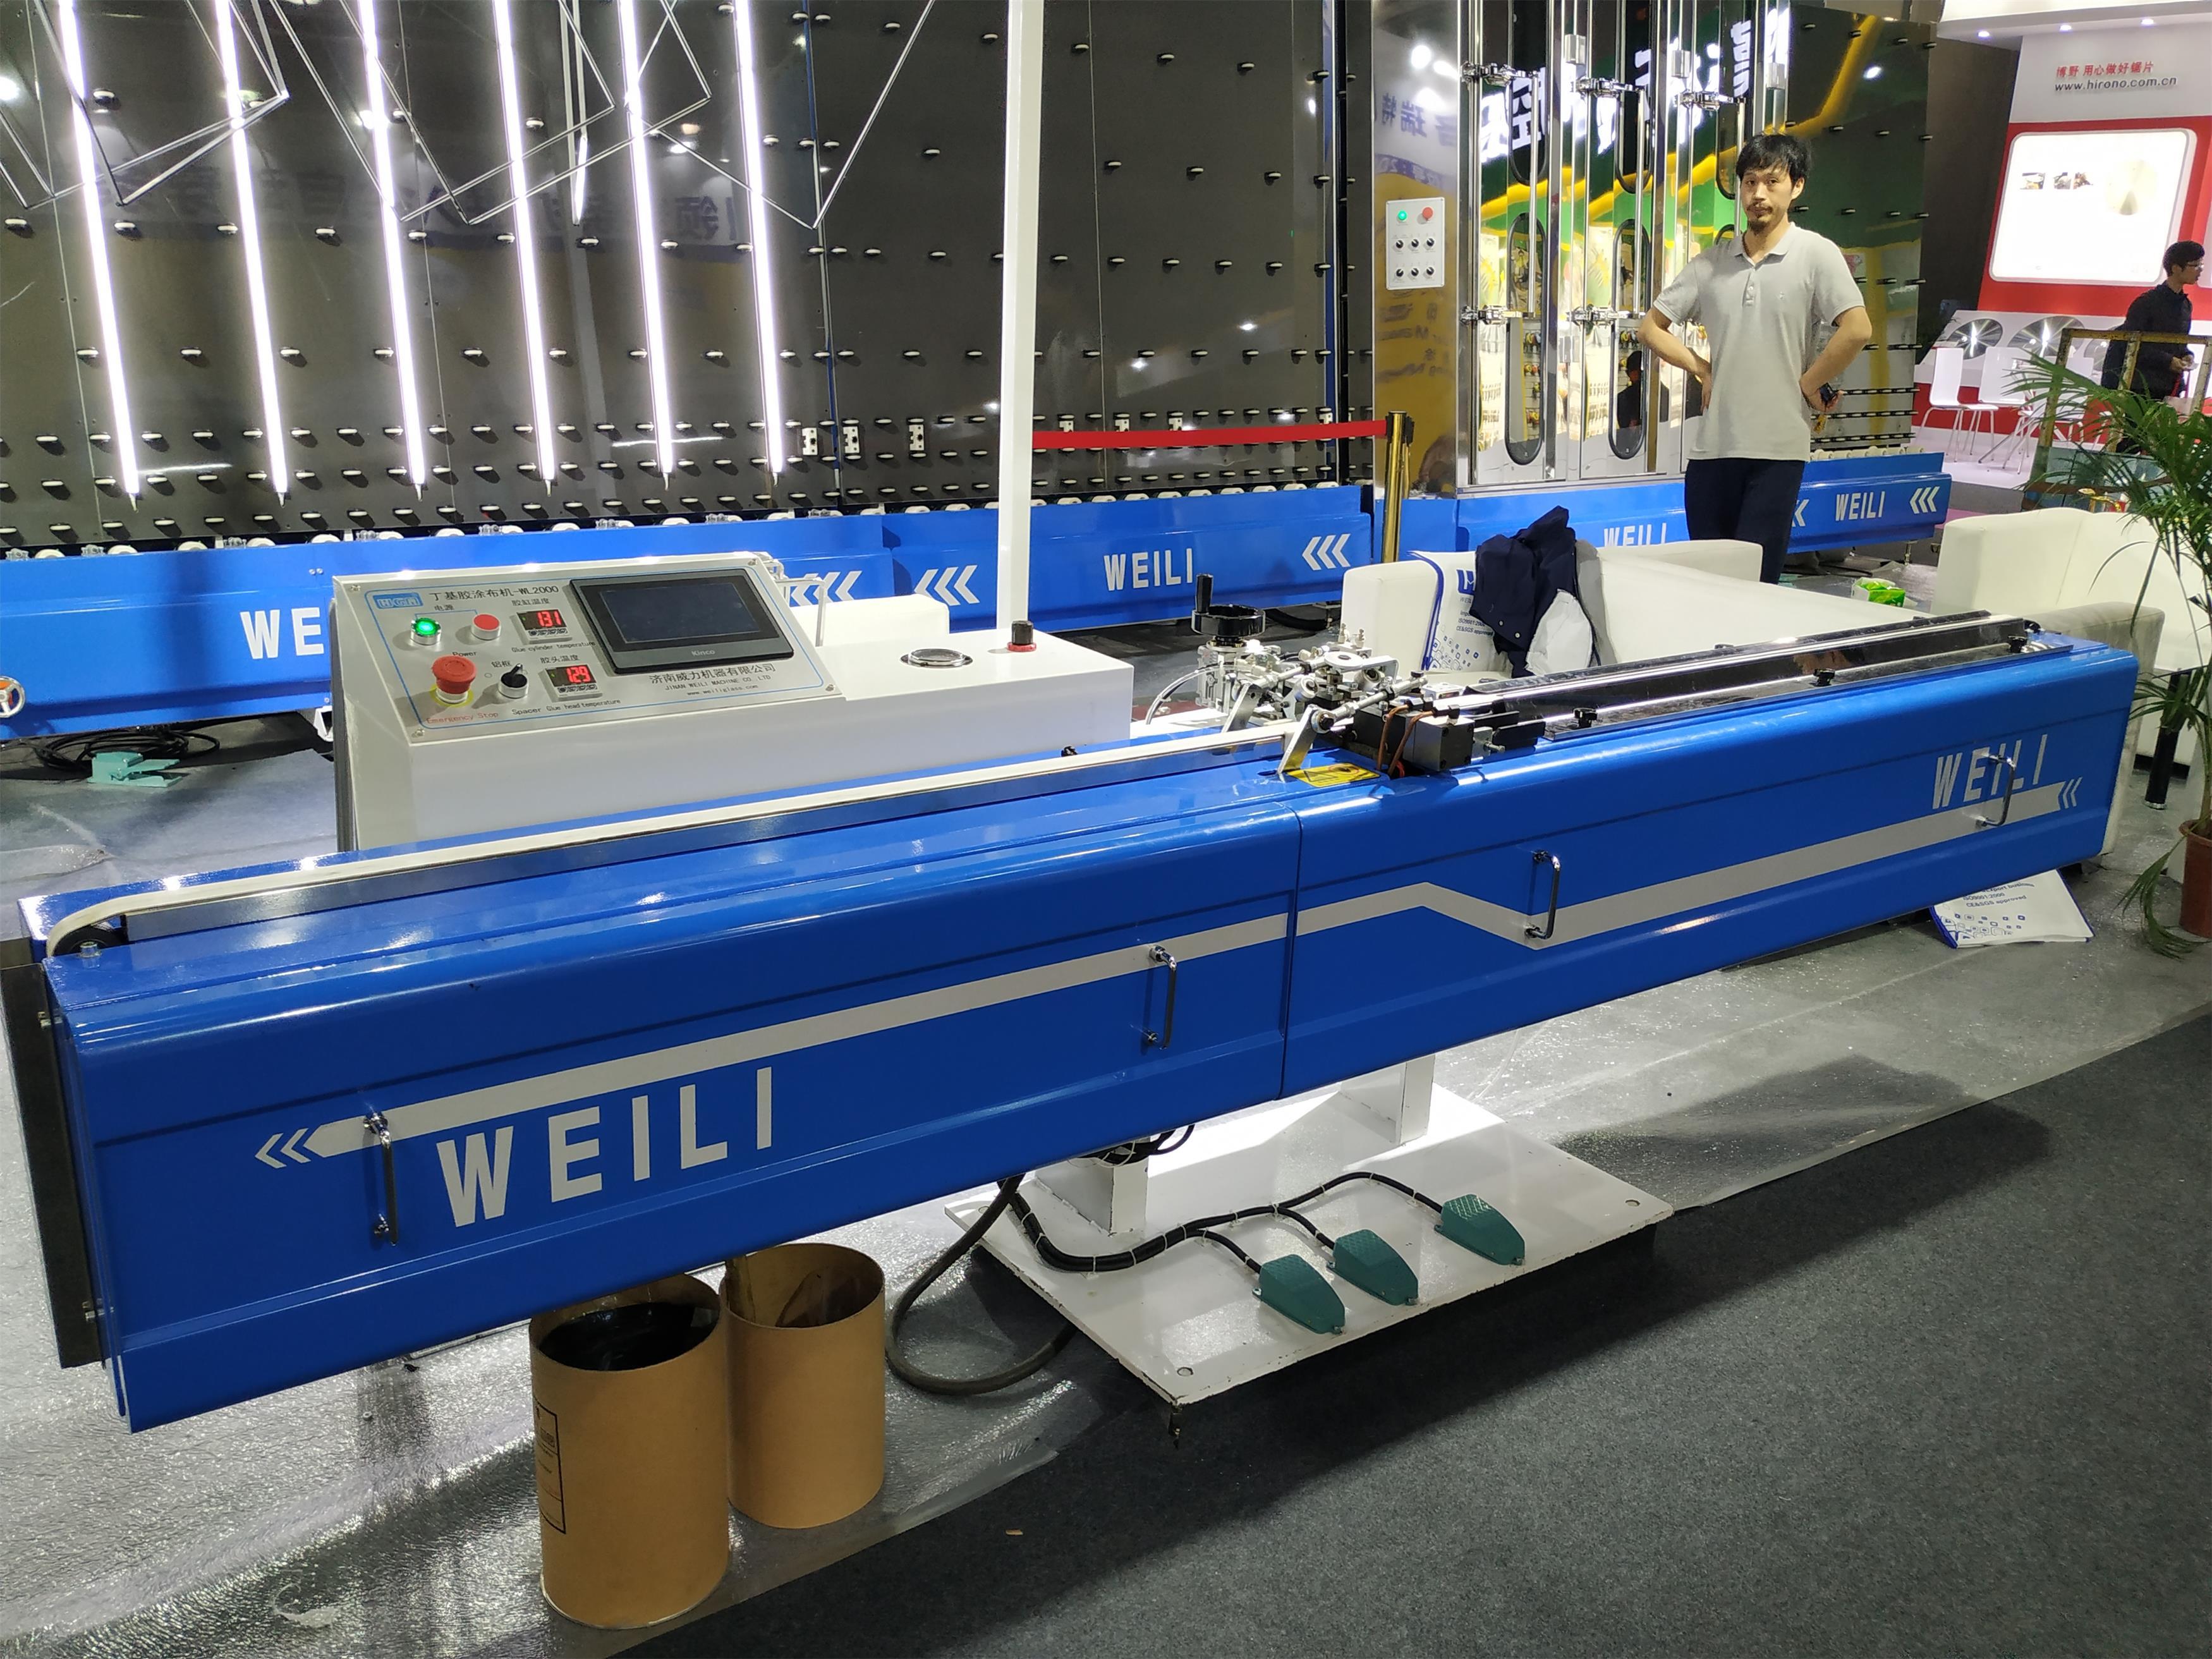 butyl extruder machine for insulating glass units